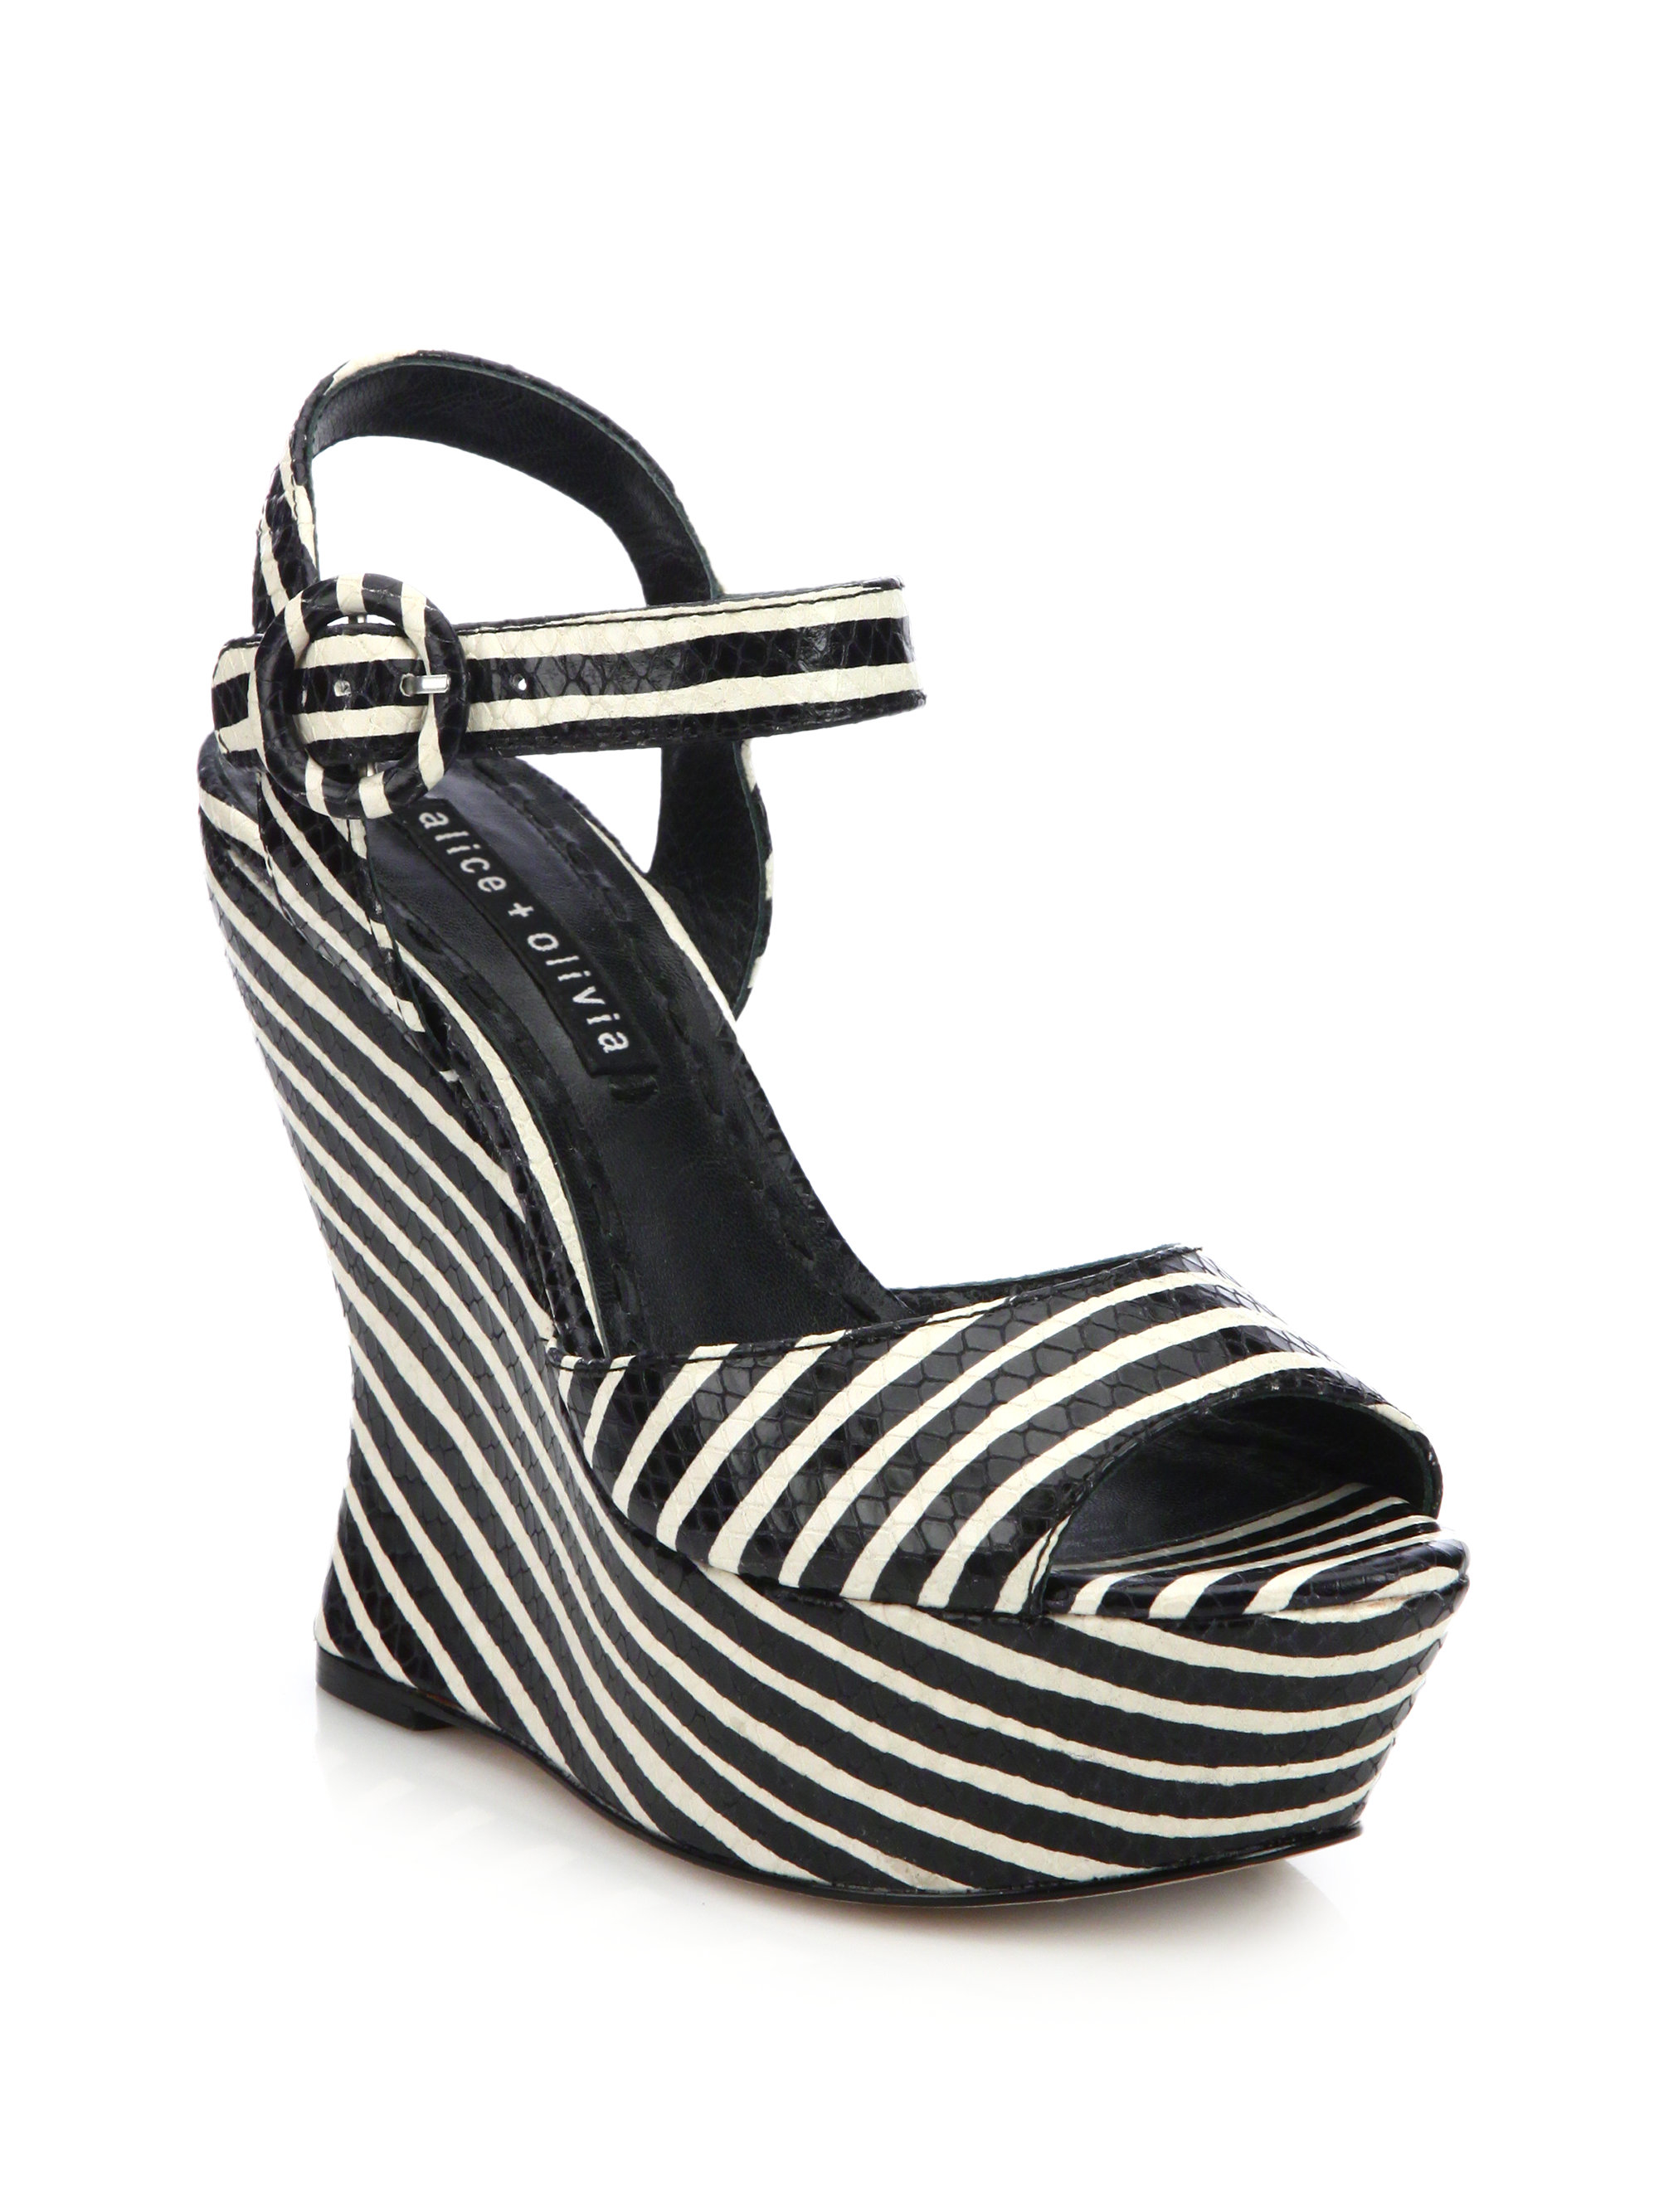 74244e16a880 Lyst - Alice + Olivia Jana Snakeskin-embossed Leather Stripe Wedge ...